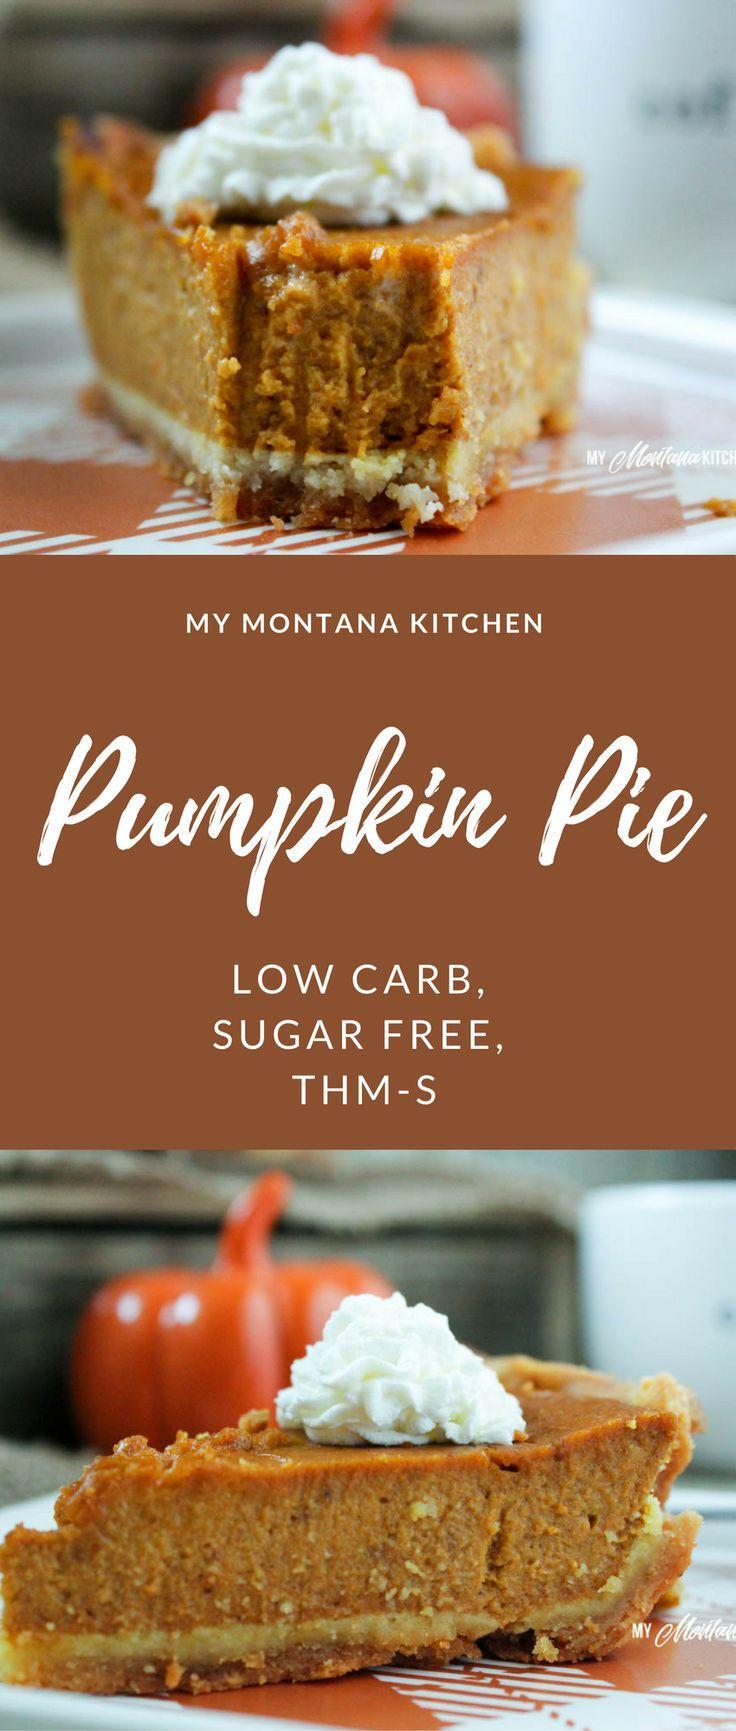 This Low Carb Pumpkin Pie Uses Sugar Free Keto Sweetened Condensed